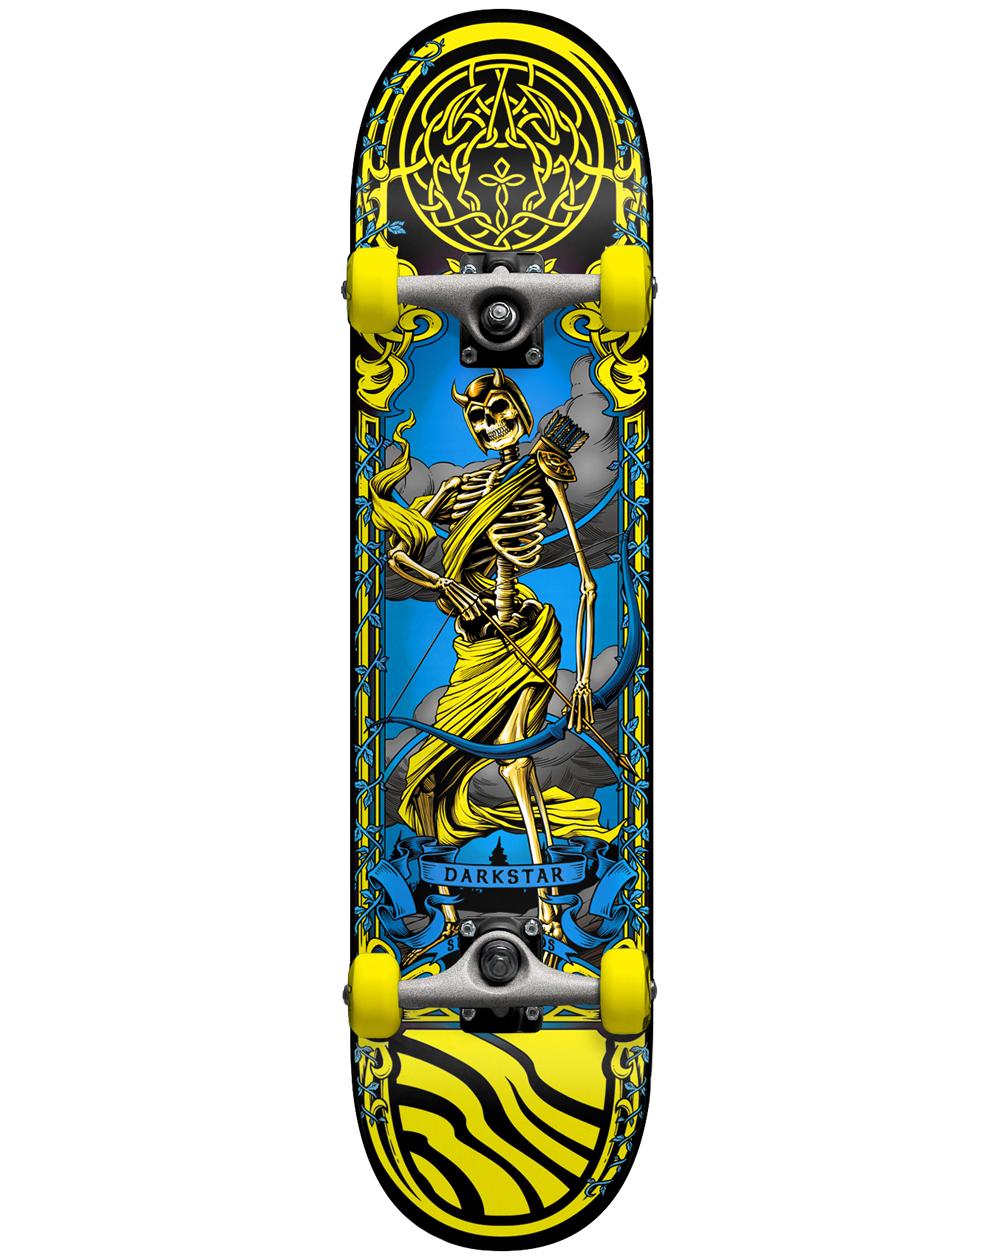 "Darkstar Skateboard Arrow 7.5"" Yellow"